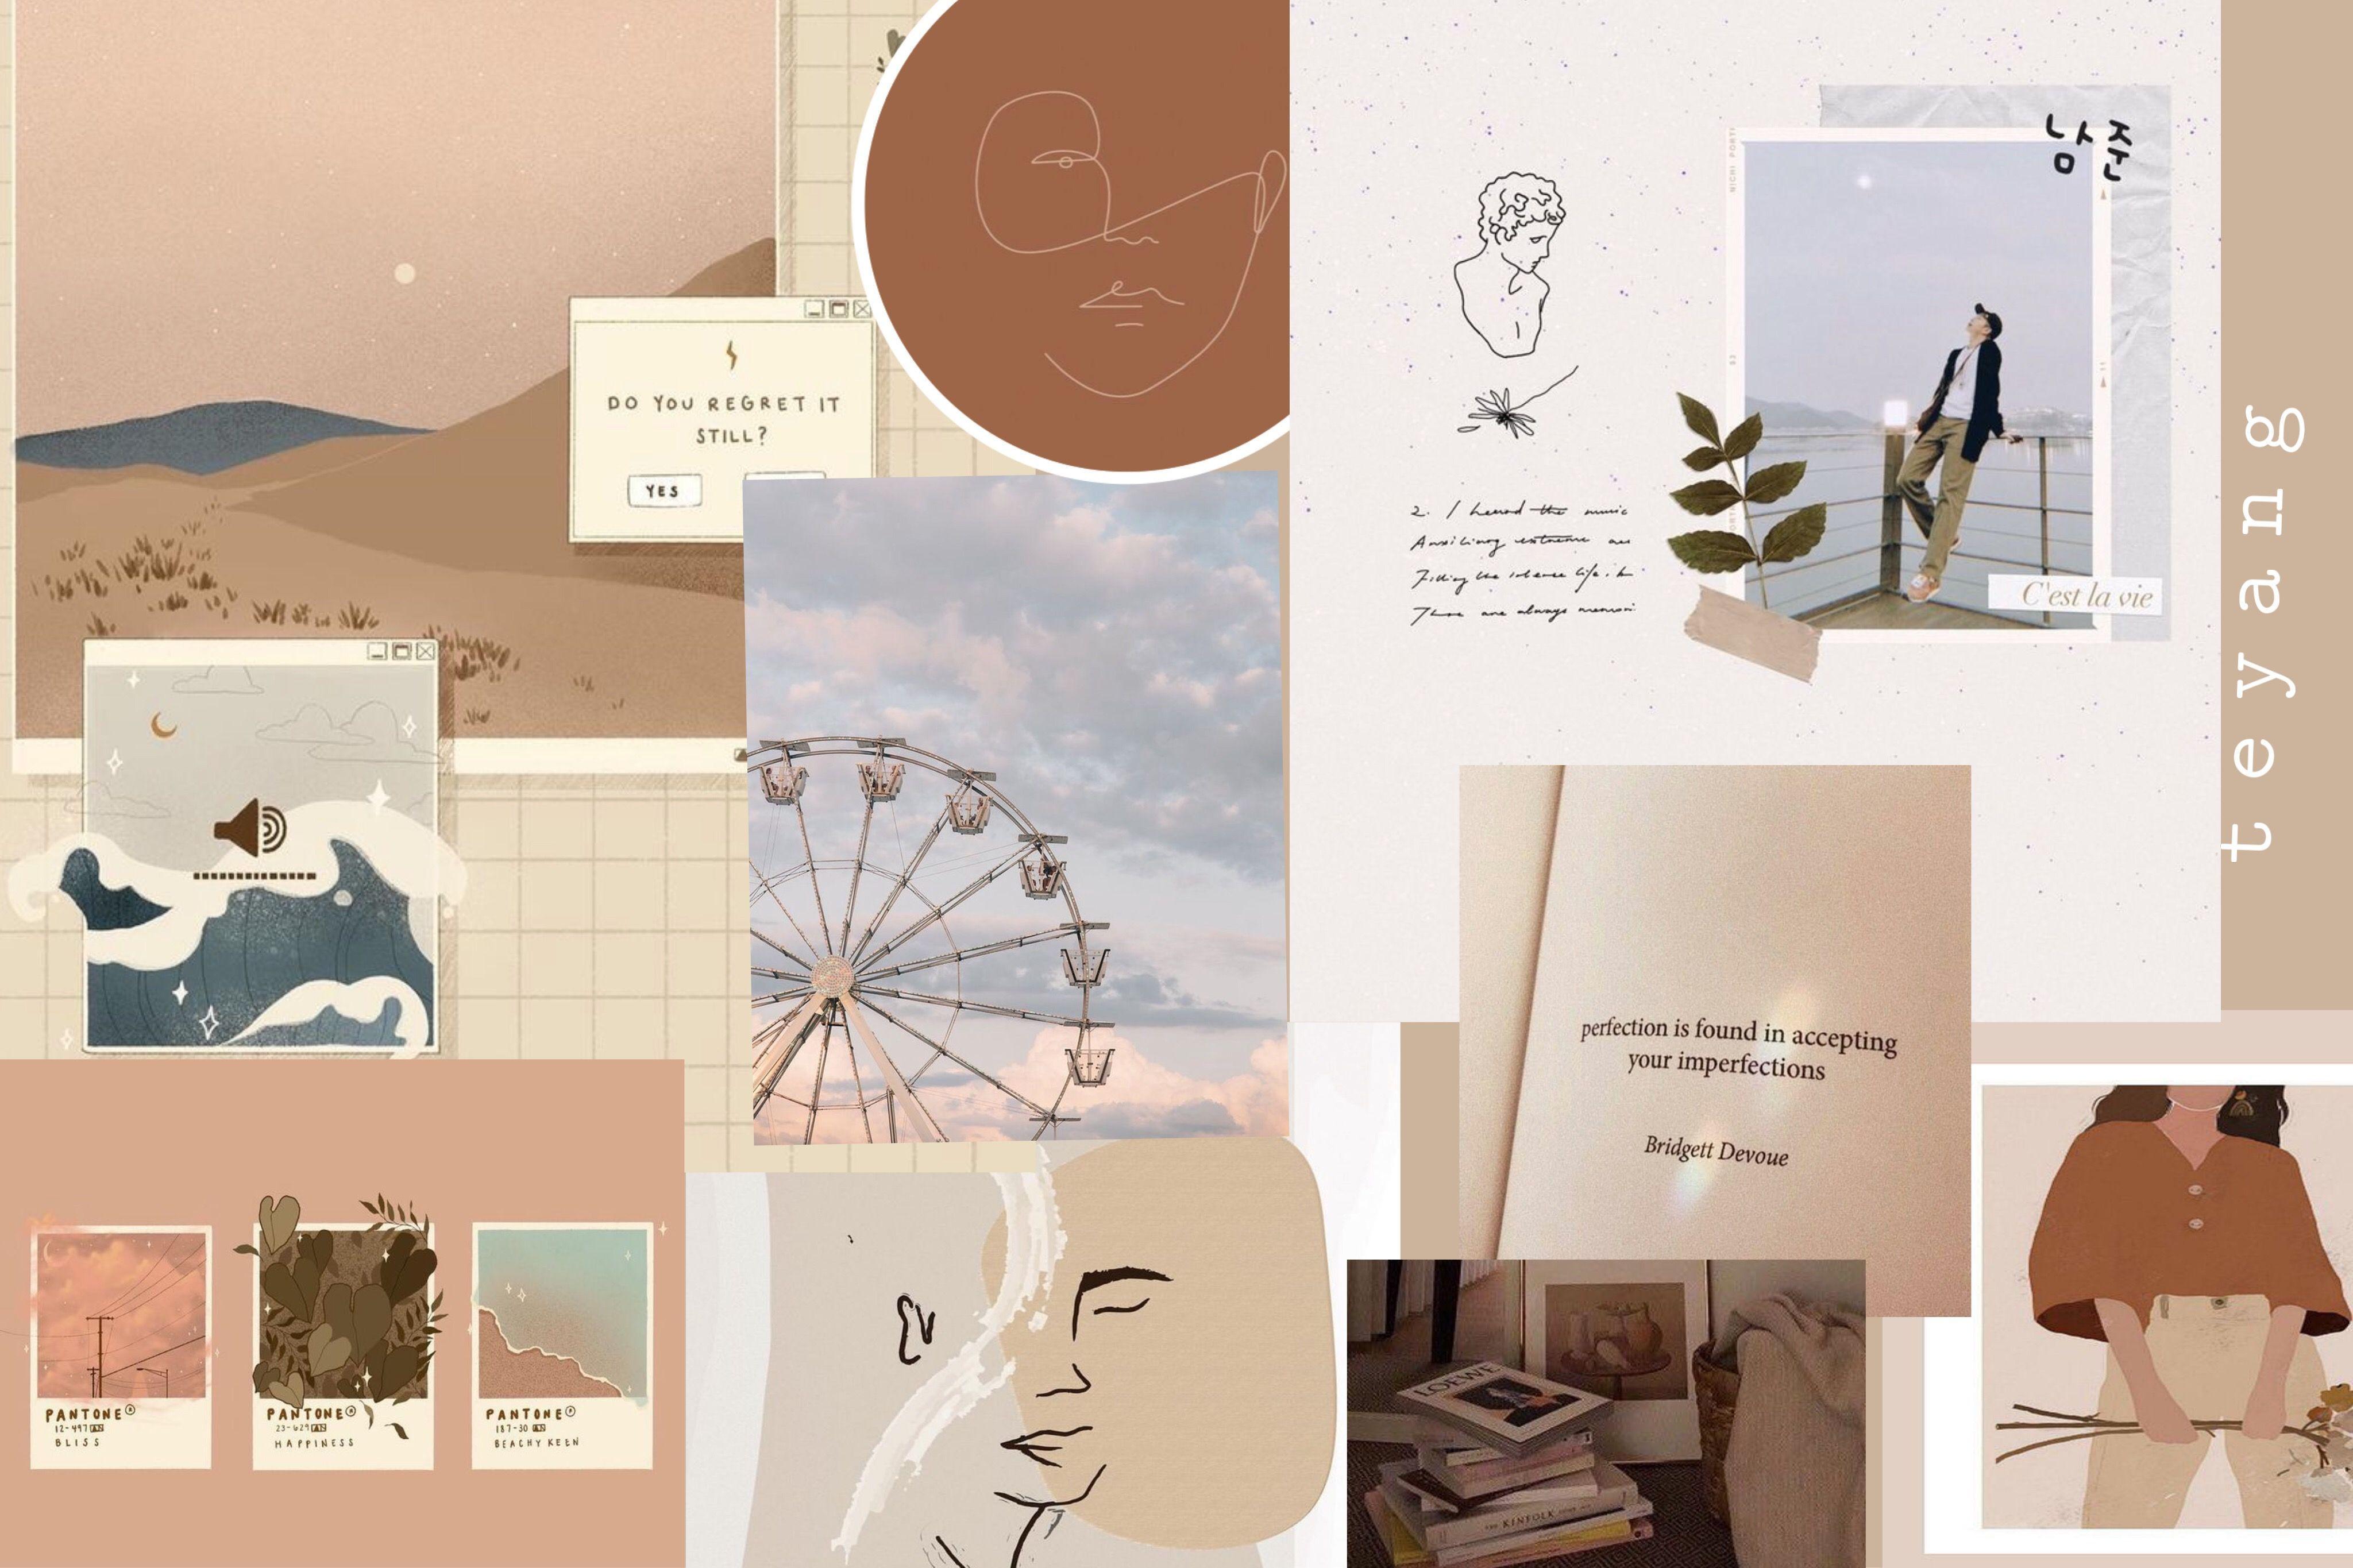 Pin by macbook pro on desktop wallpaper macbook | Cute ...